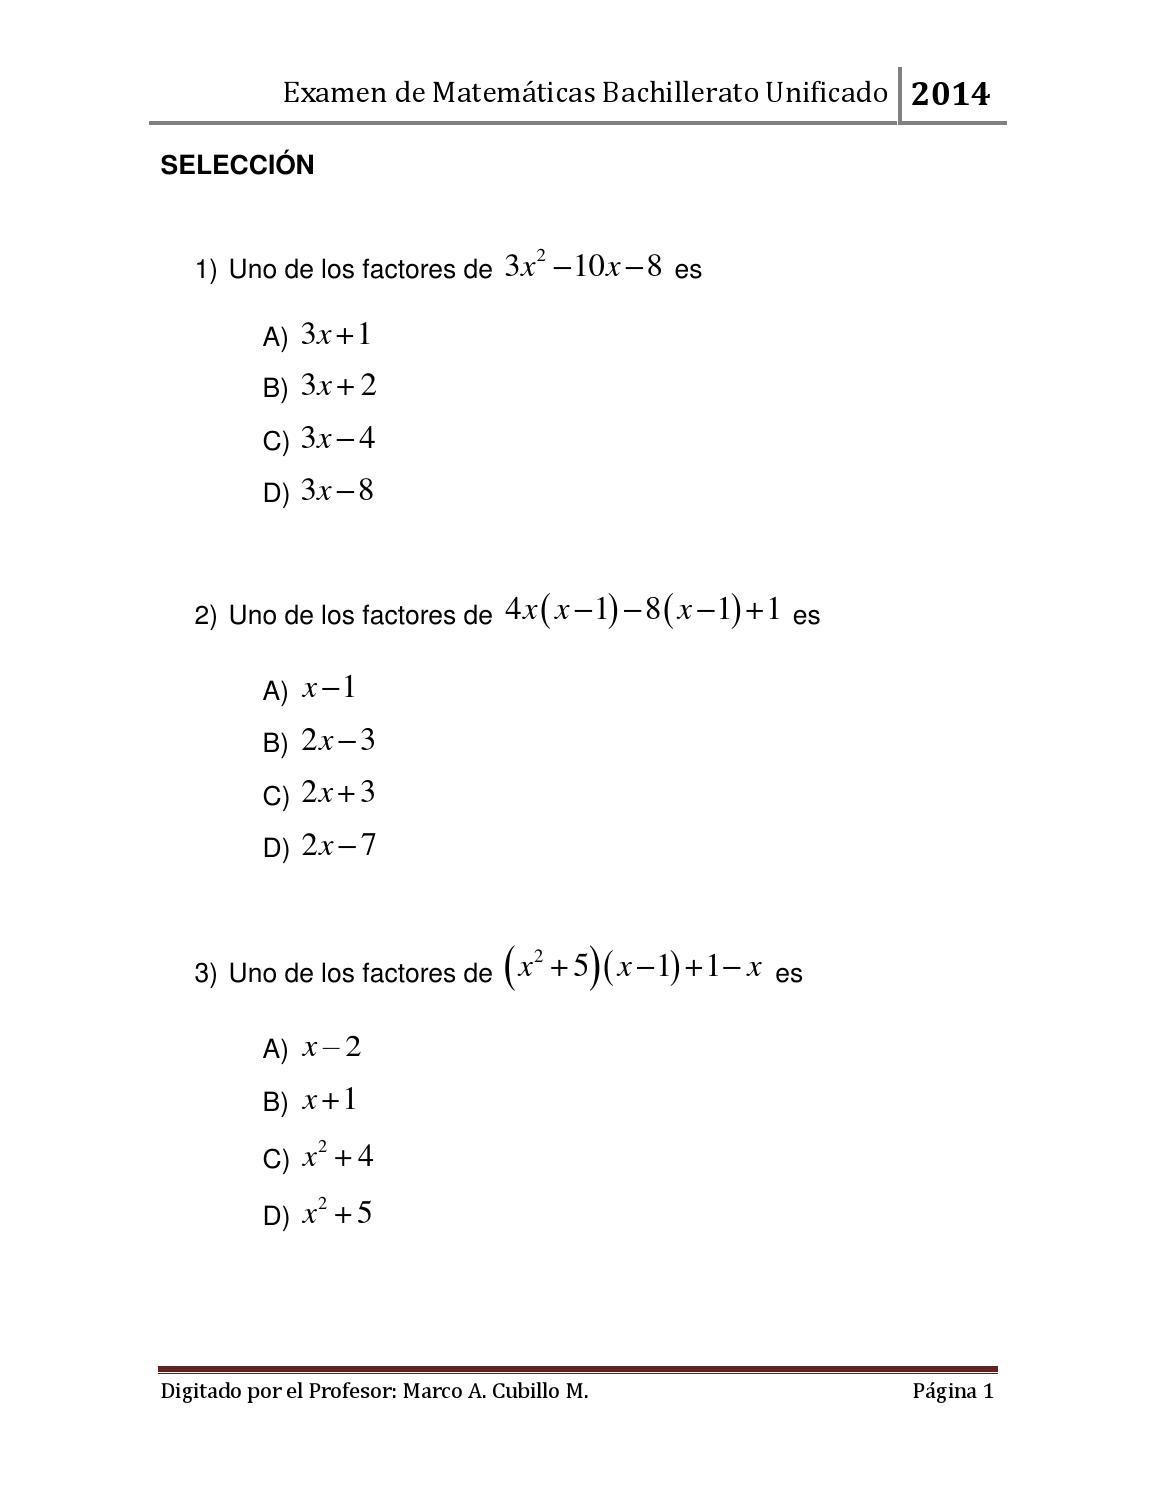 Examen mate 02 2014 unificado by Marco Antonio Cubillo Murray - issuu